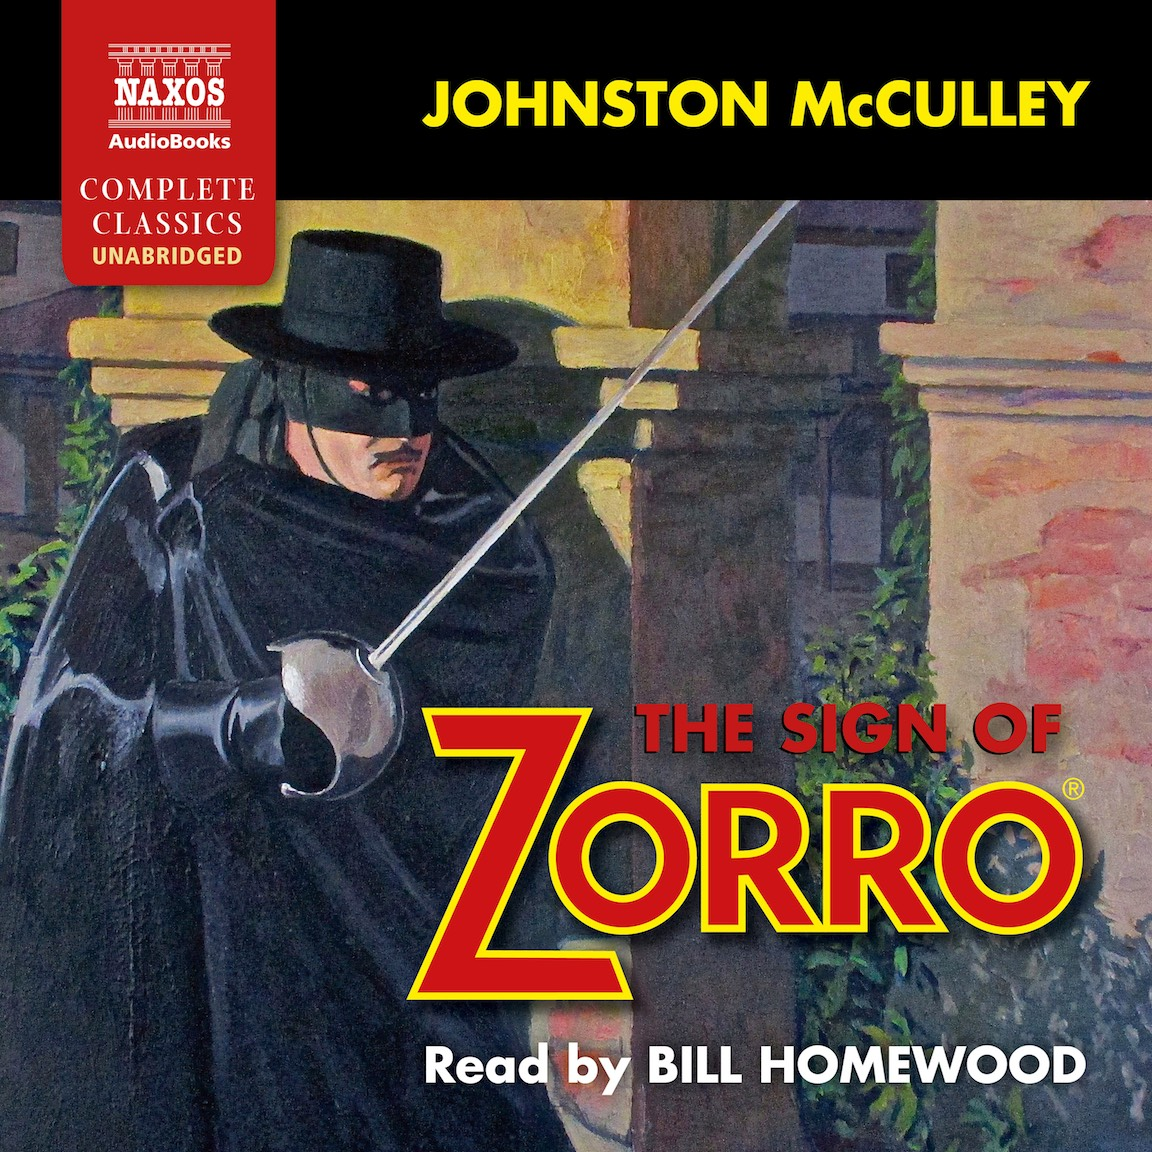 The Sign of Zorro (unabridged)